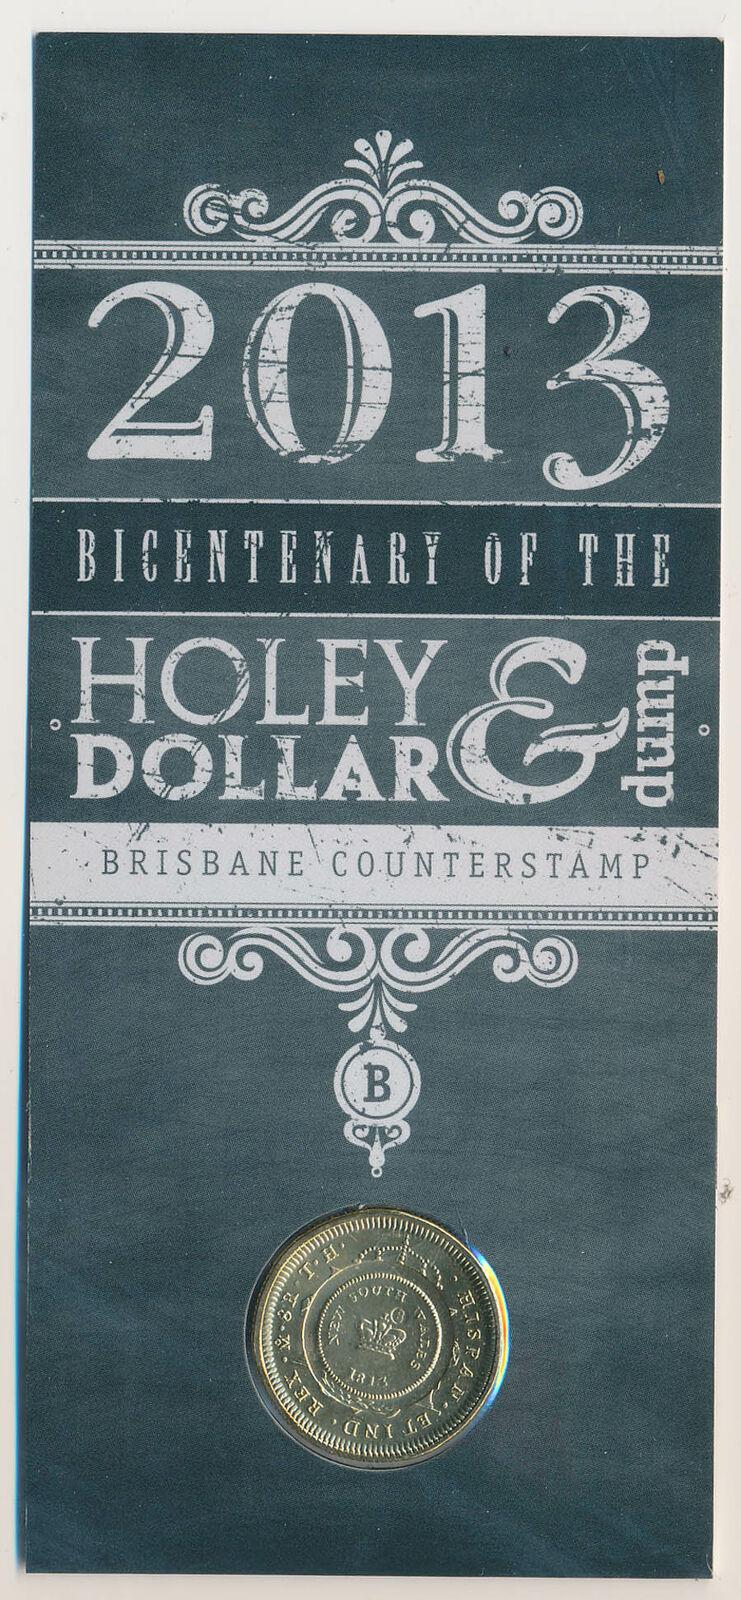 Thumbnail for 2013 Holey Dollar & Dump Bicentenary - Brisbane Counterstamp